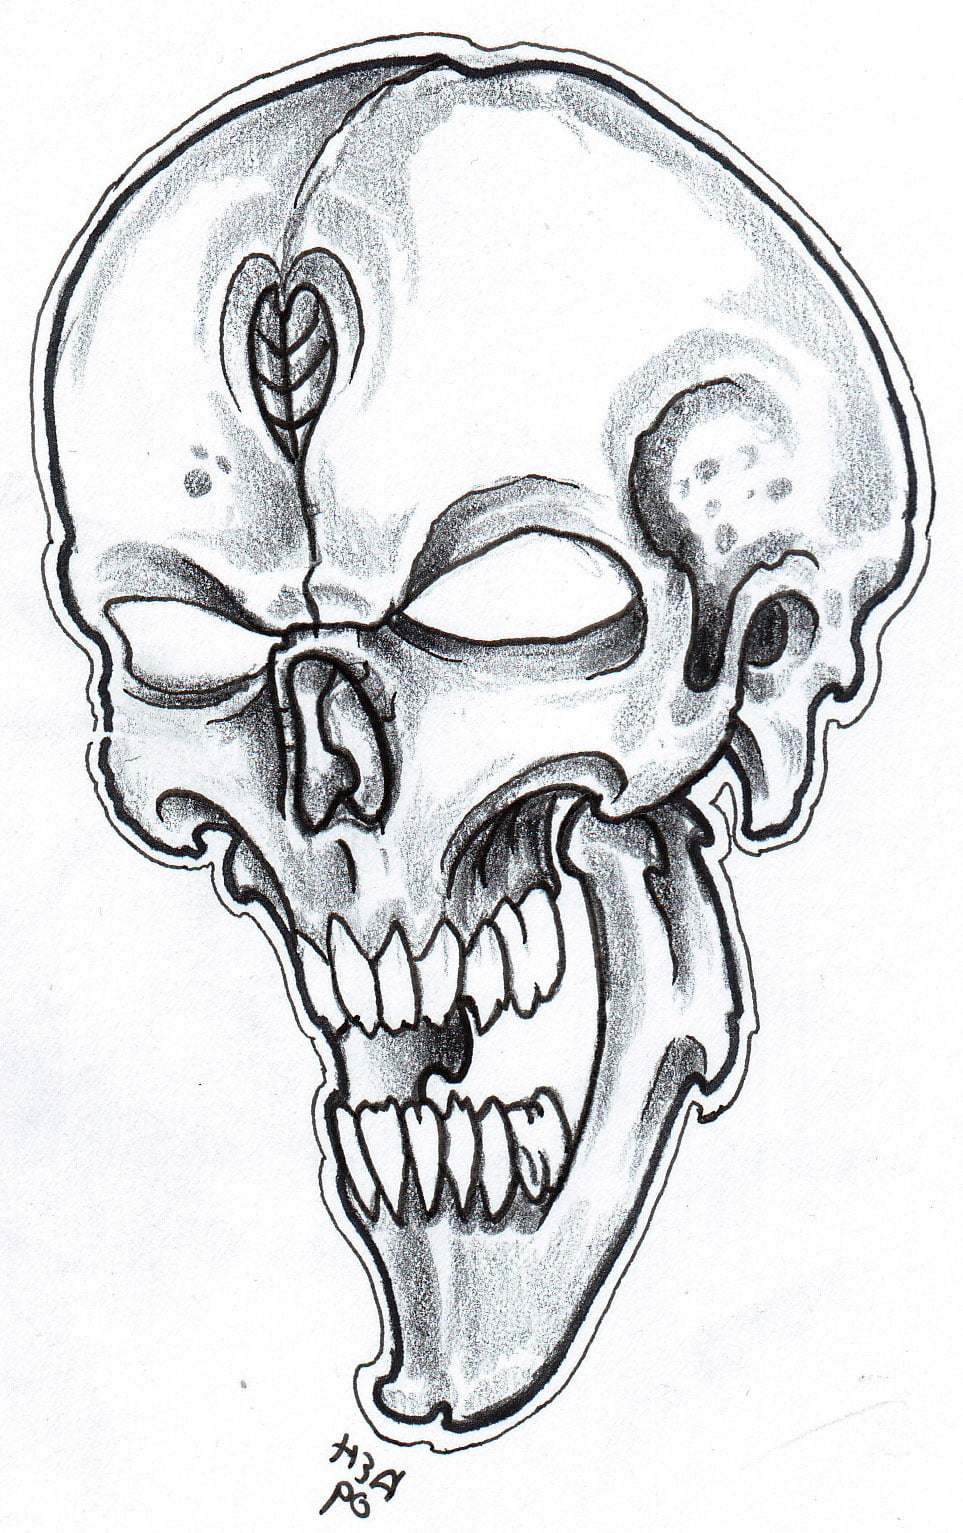 Tattoo drawings of skulls cool tattoos bonbaden for Cool tattoo drawings